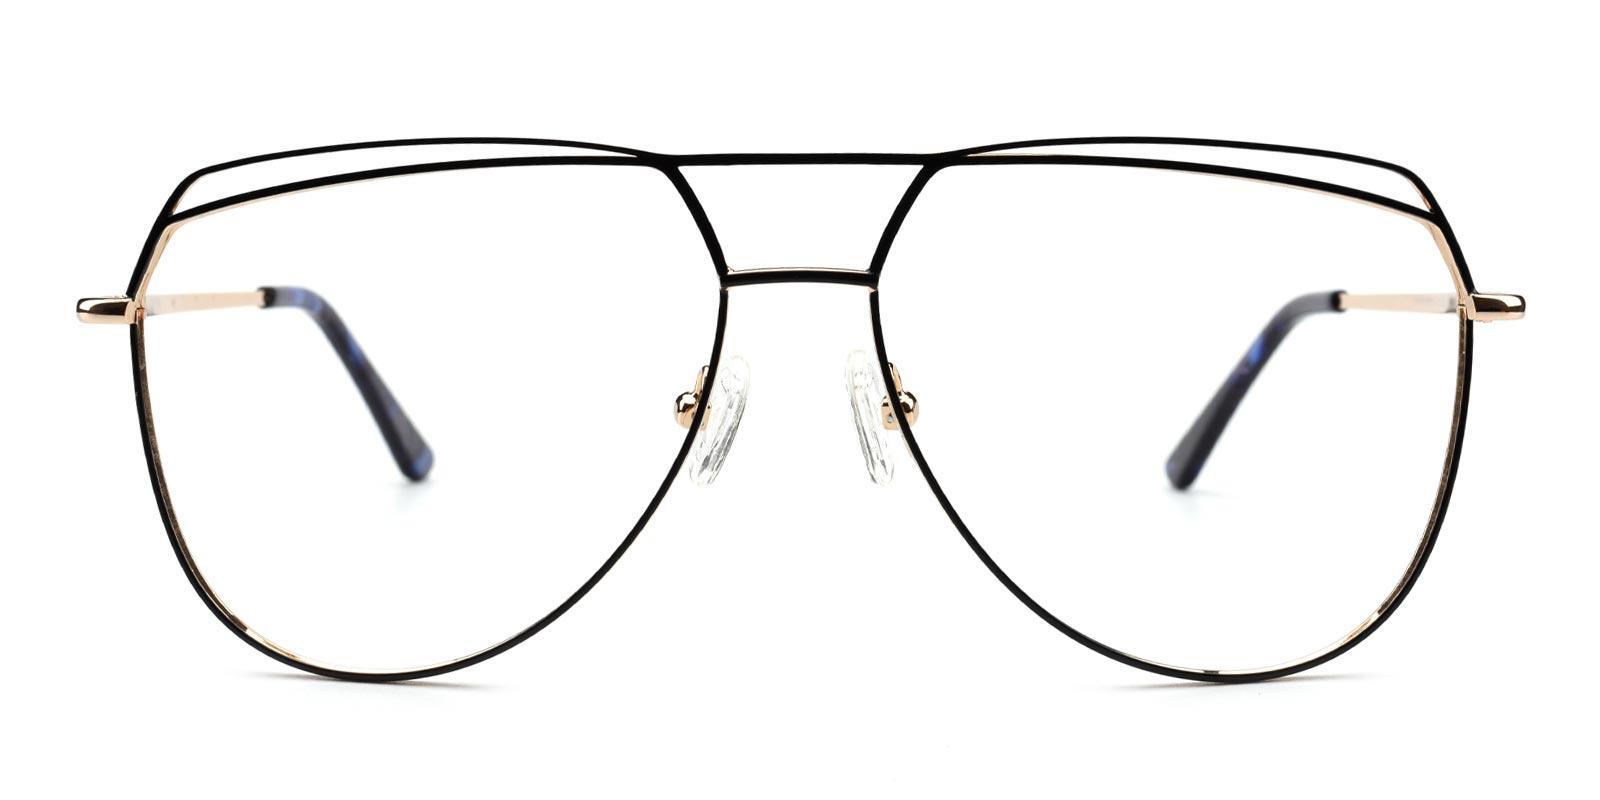 Nicole-Black-Aviator-Metal-Eyeglasses-additional2